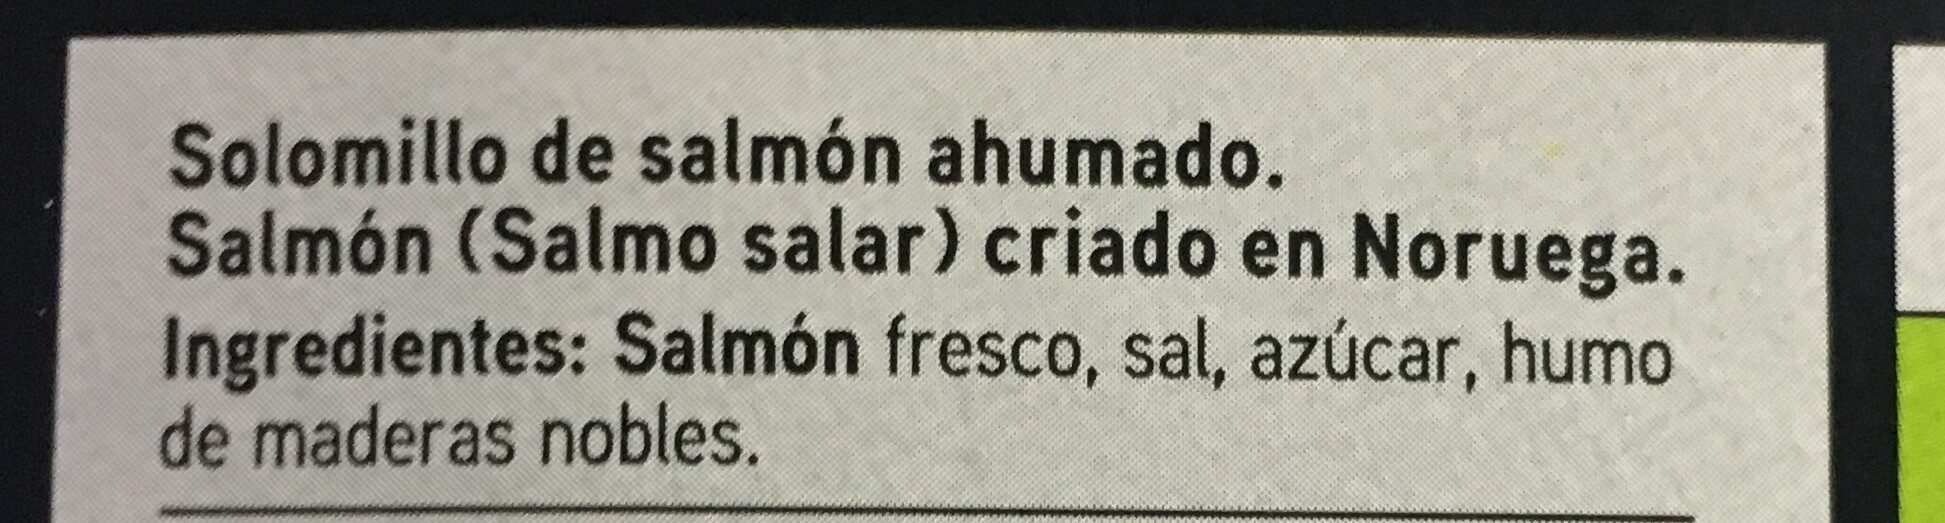 Seleqtia - Solomillo de salmón - Ingredientes